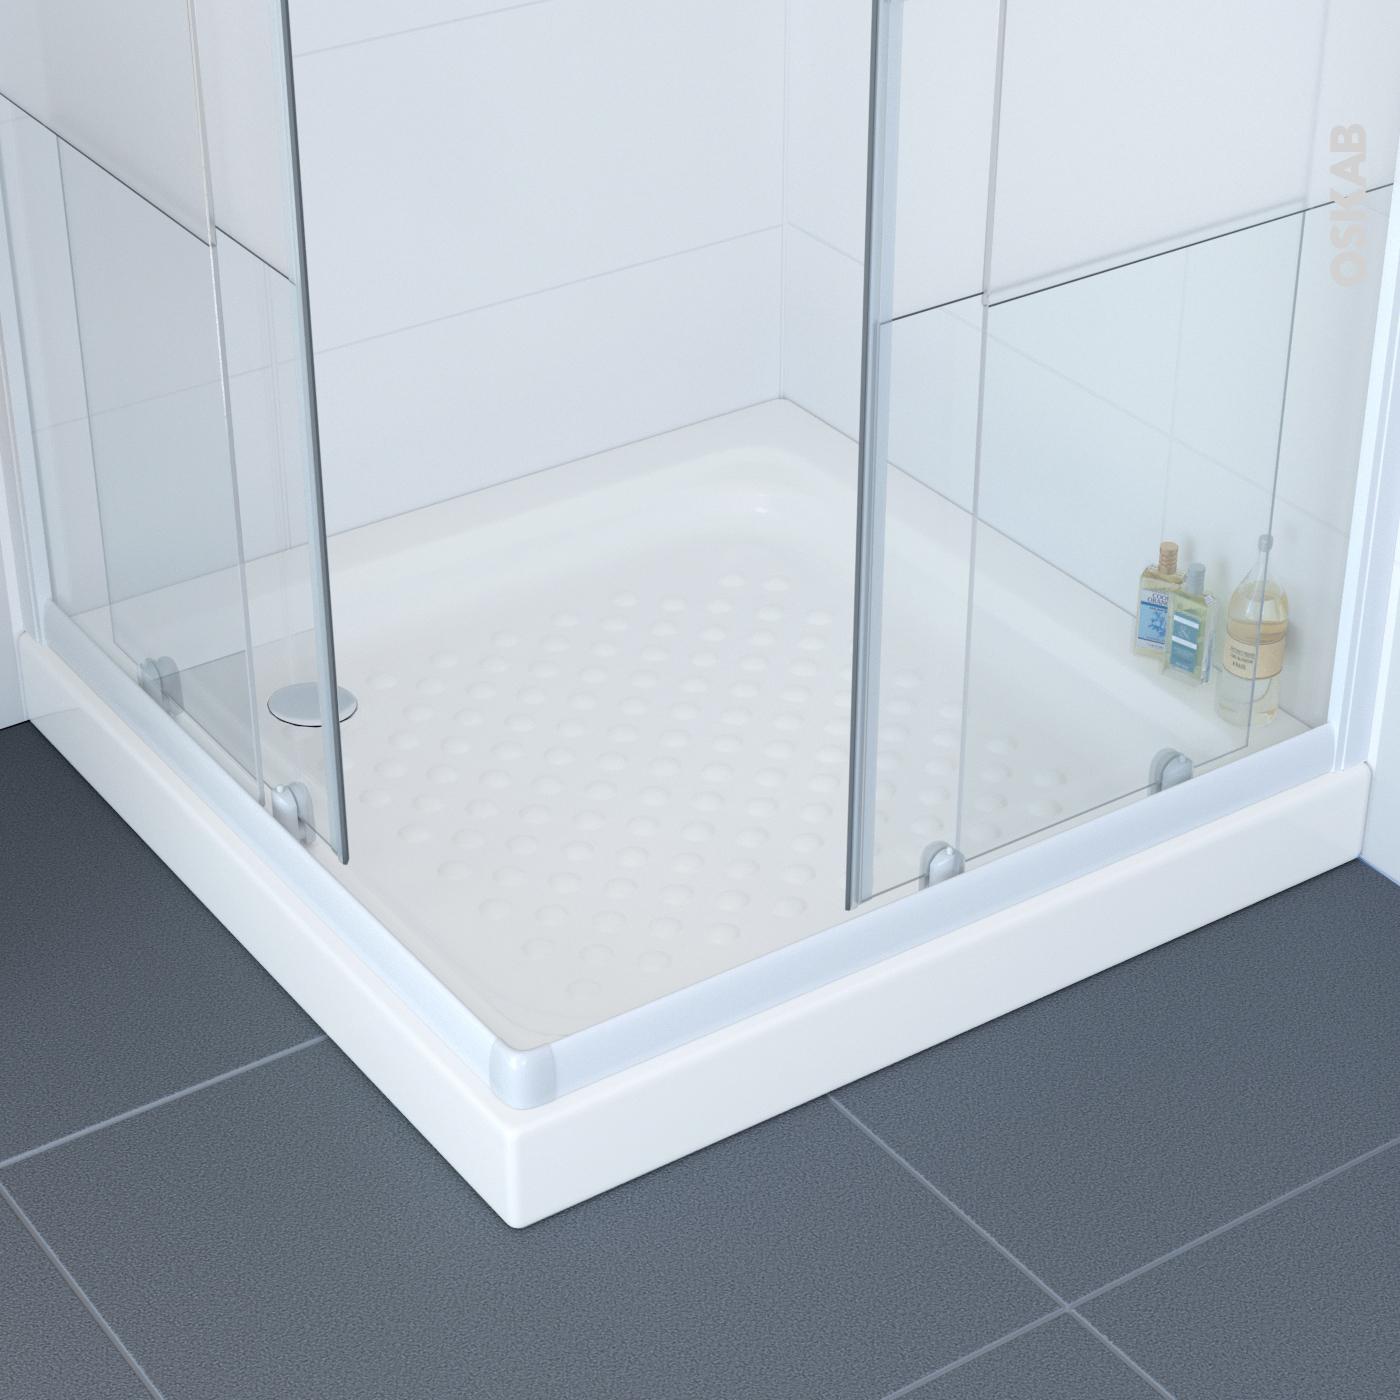 beau receveur de douche 80 80 renaa conception. Black Bedroom Furniture Sets. Home Design Ideas